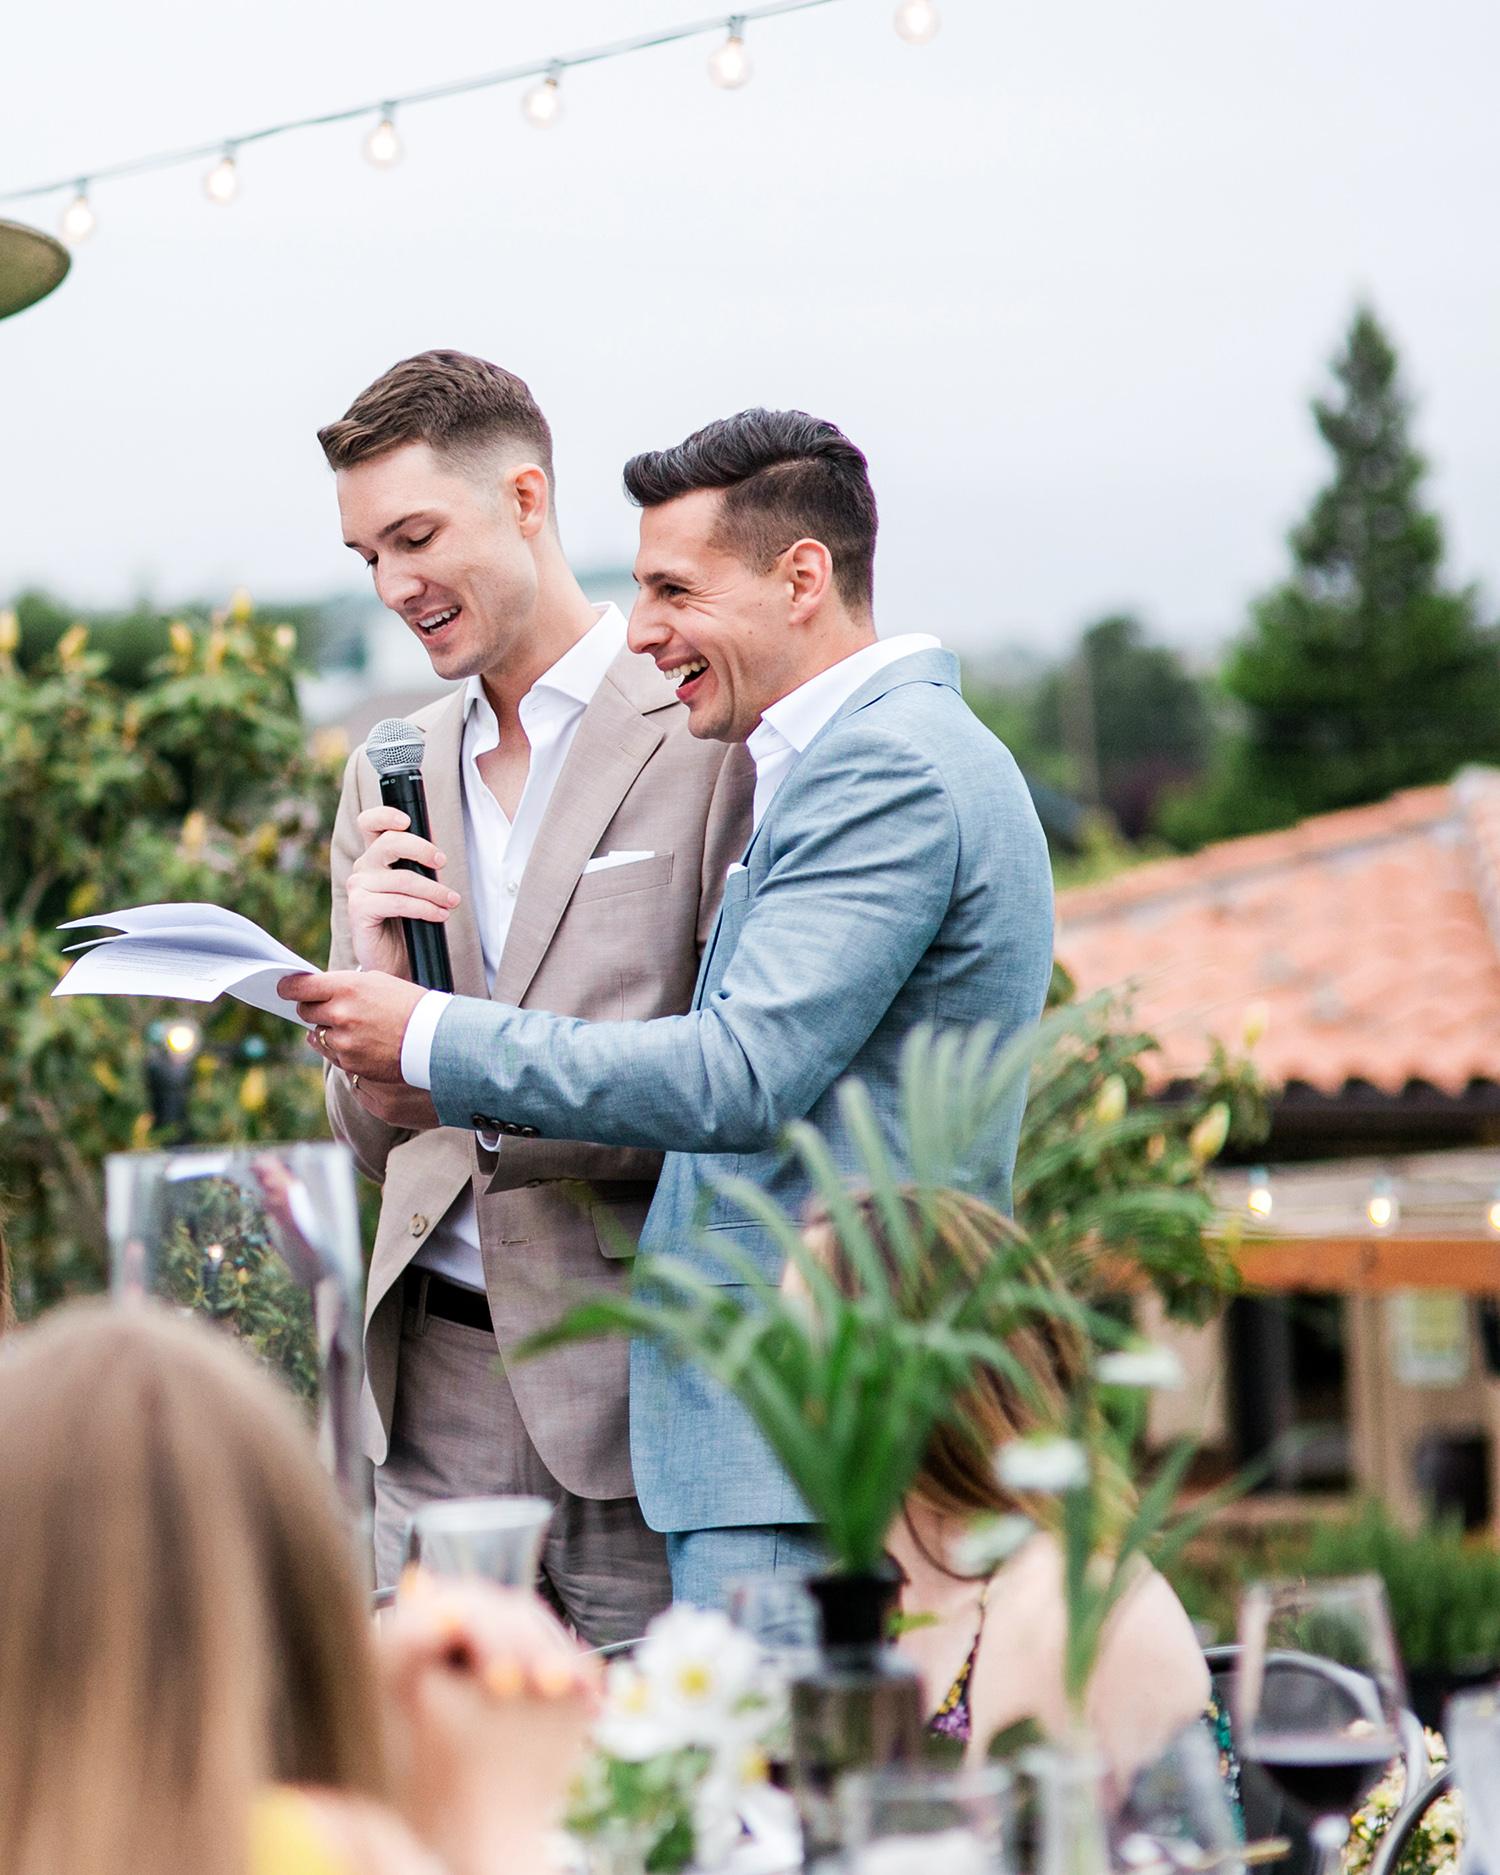 david tim wedding toasts grooms couple